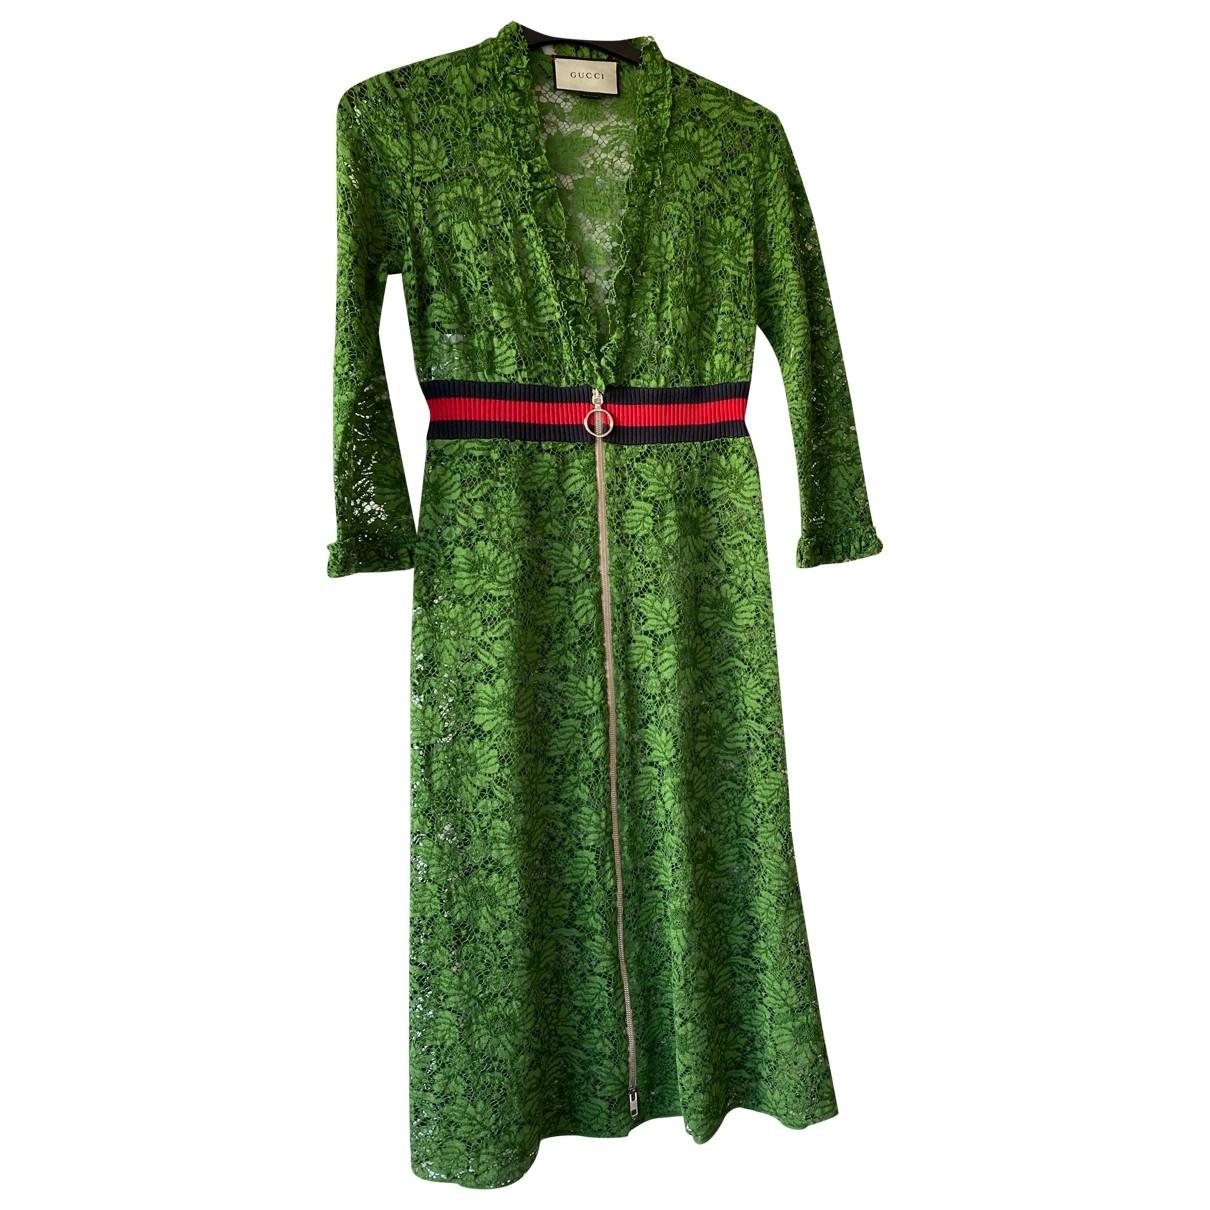 Gucci \N Green Cotton dress for Women 40 IT